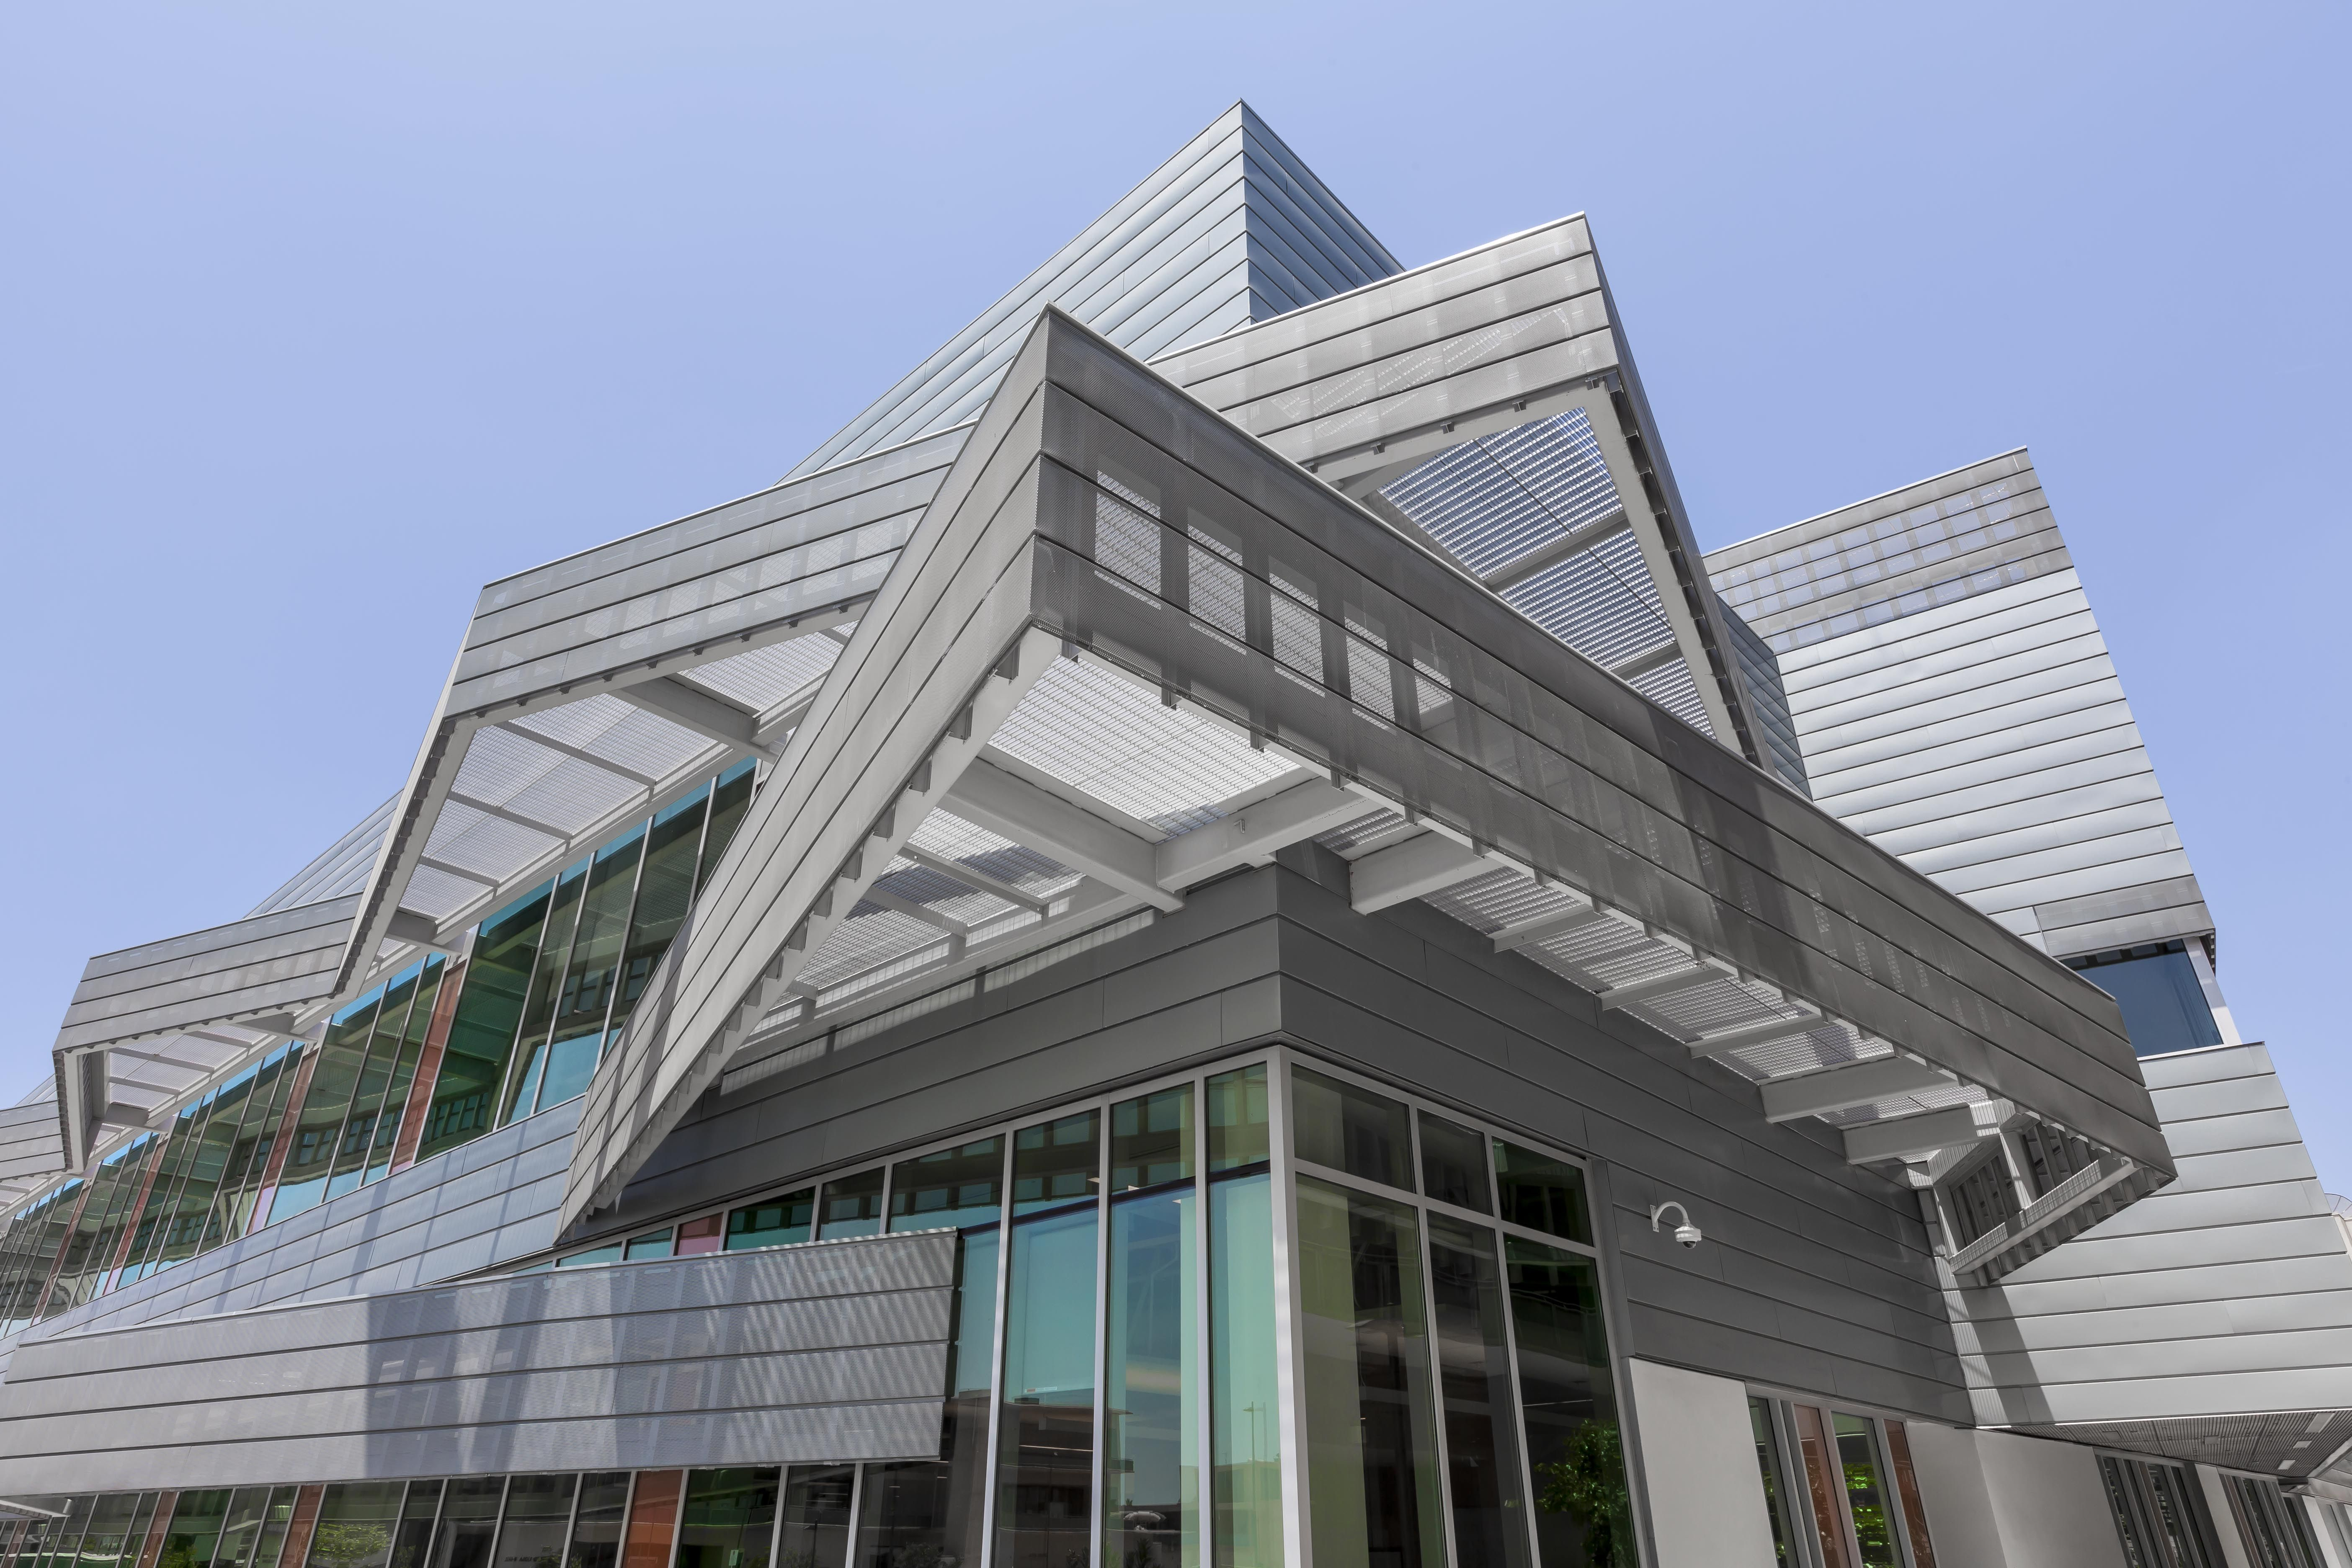 Los angeles trade technical college mariposa hall los - Interior design colleges in los angeles ...